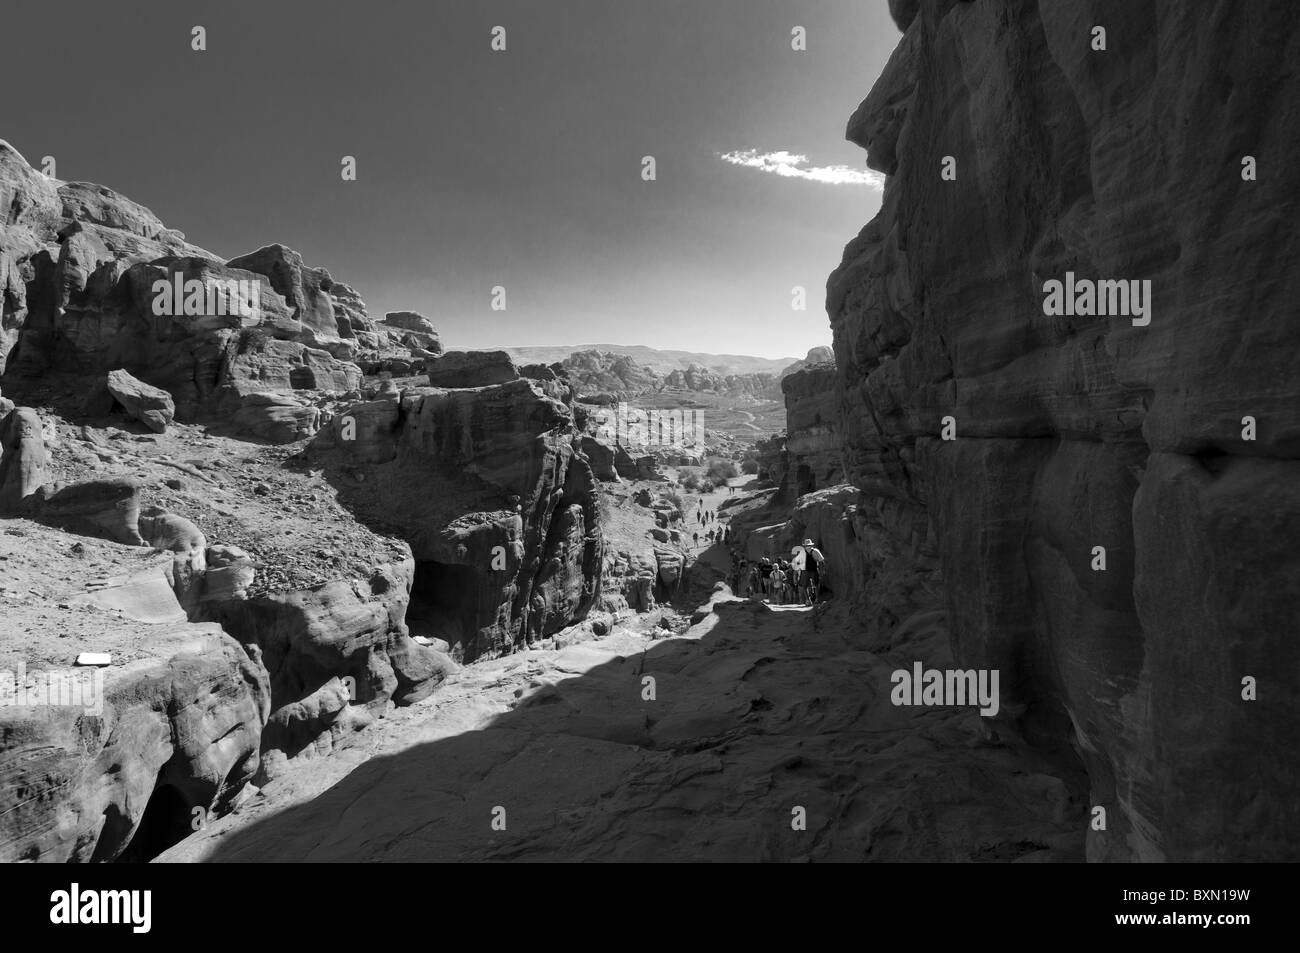 Petra Royal Kingdom of Jordan - Stock Image